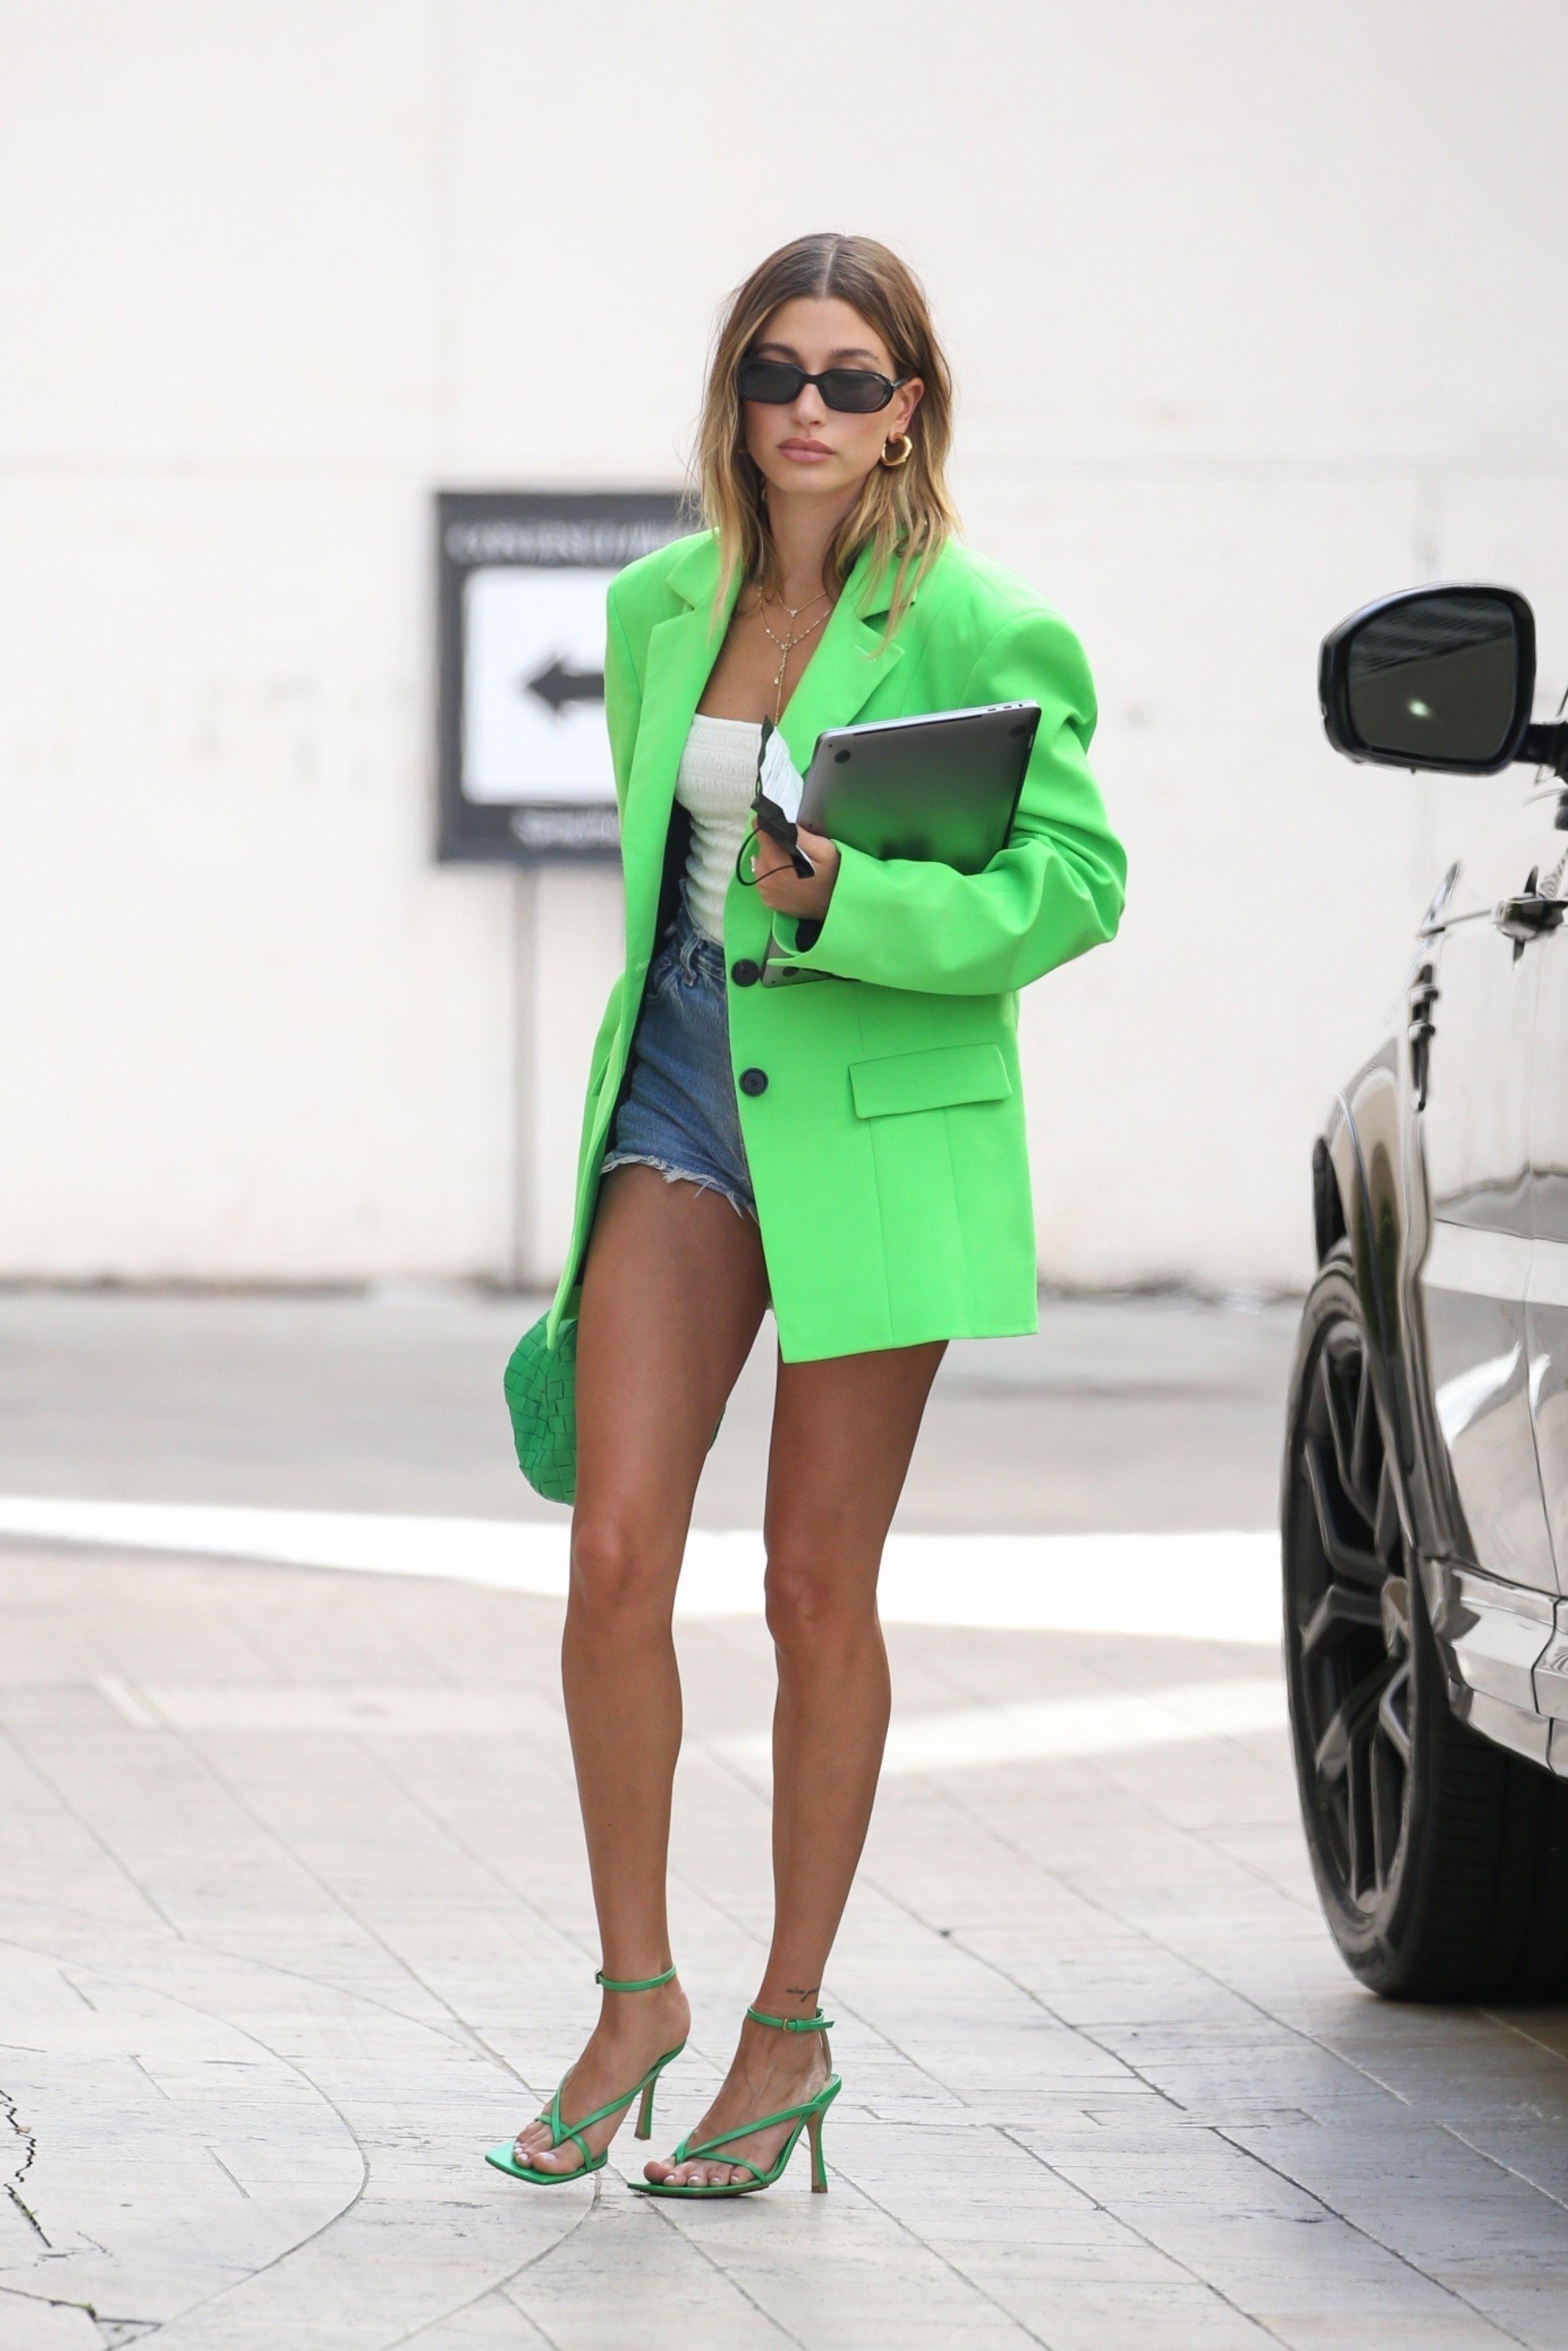 Hailey Bieber Wears Short Shorts With a Neon Green Blazer